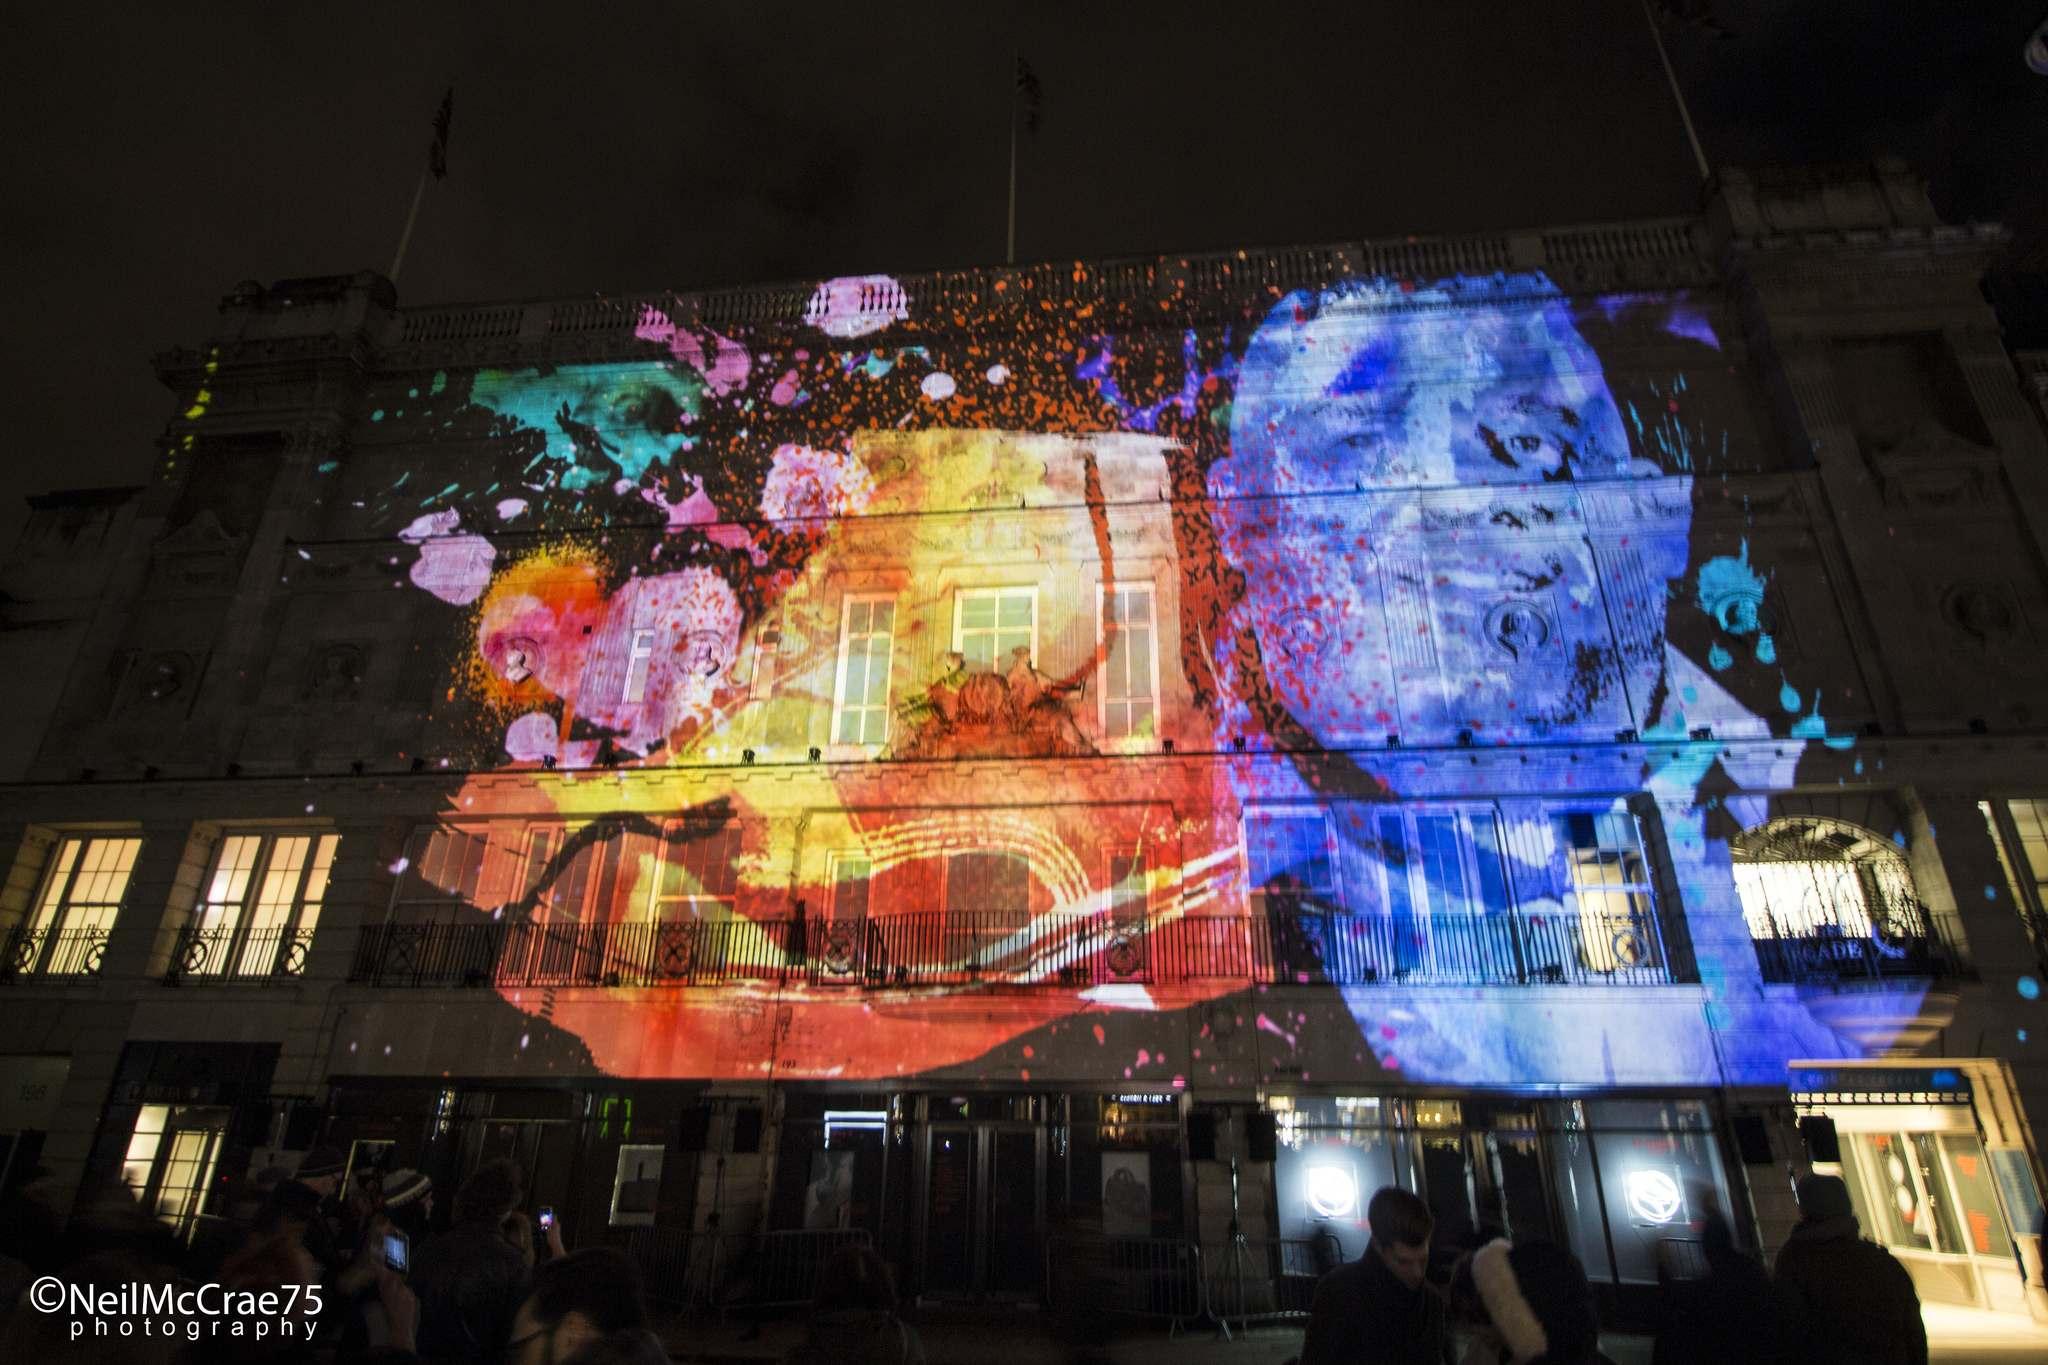 london lumiere festival11 The London Light Lumiere Festival by Neil McCrae